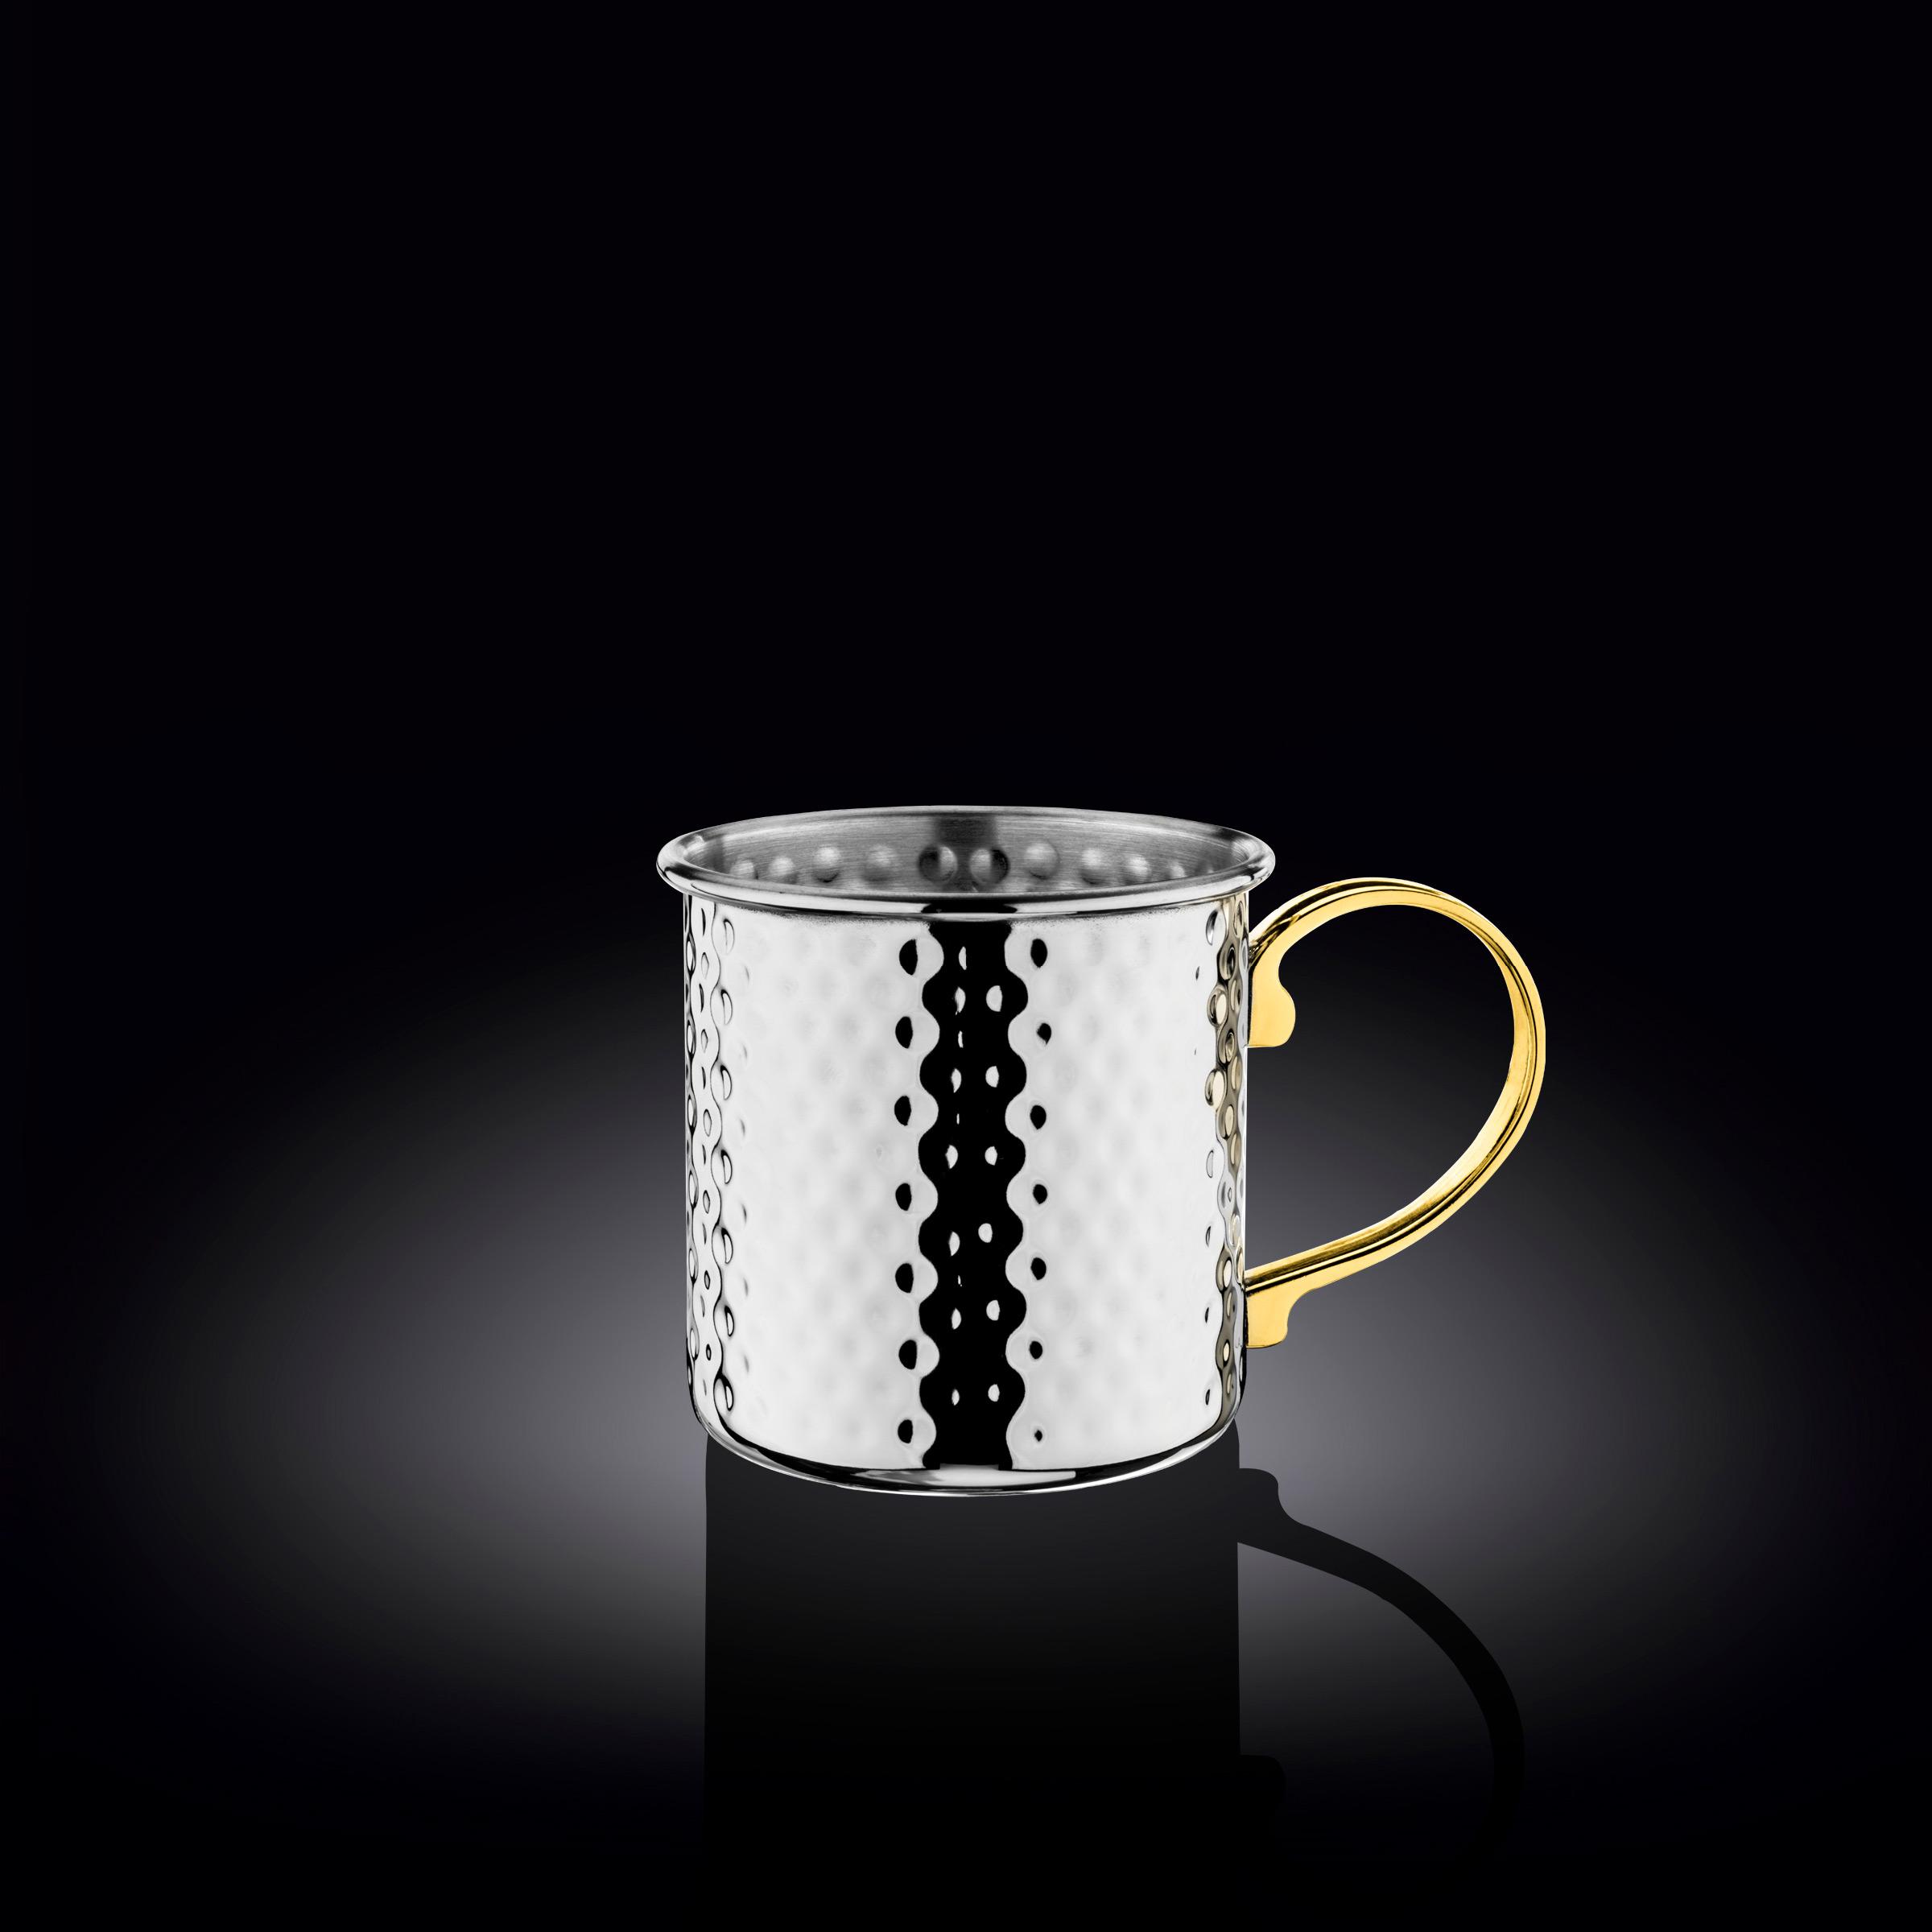 【Wilmax England】 マブカップ(シルバーカラー) <br>No.32209